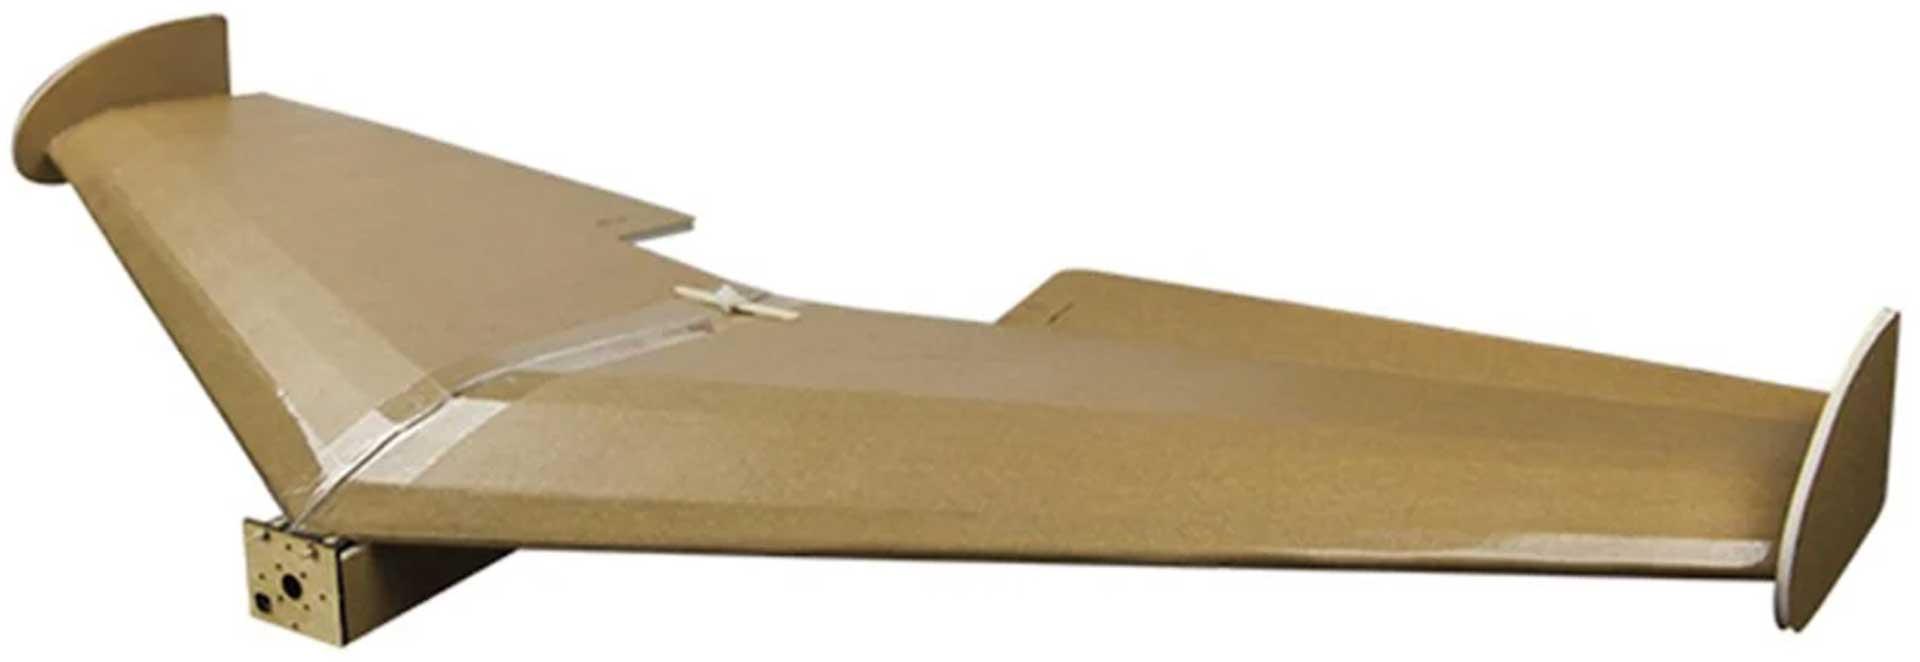 FLITE TEST Versa Wing Speed Build Electric Airplane Kit (965mm)